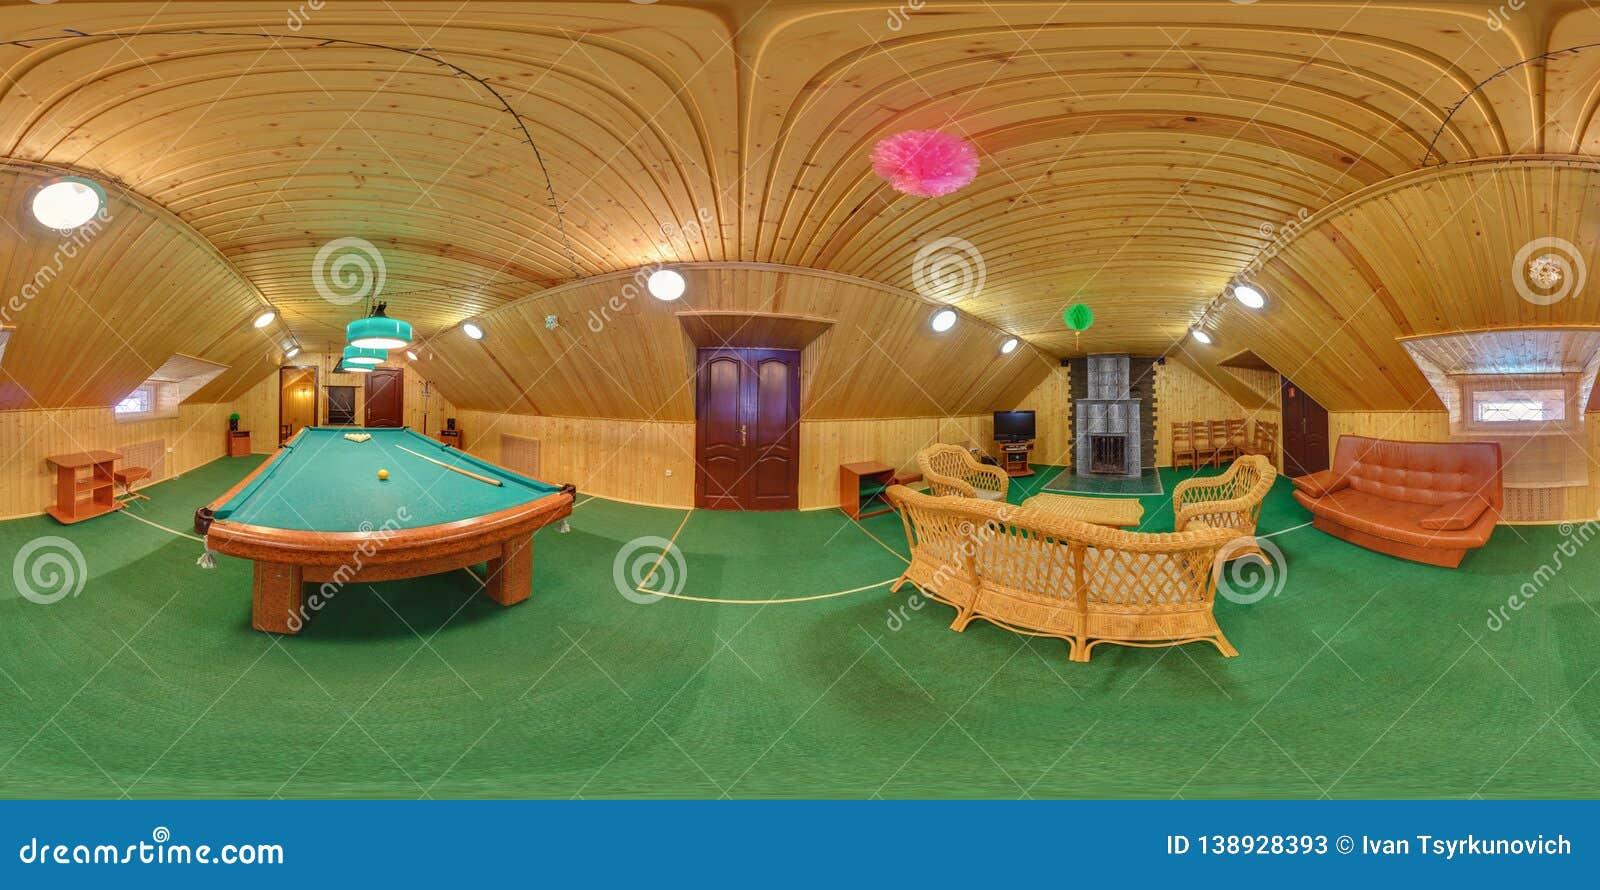 MINSK, BELARUS - JUNE 26, 2012: Panorama in interior billiard wooden hall. Full spherical 360 by 180 degrees seamless panorama in